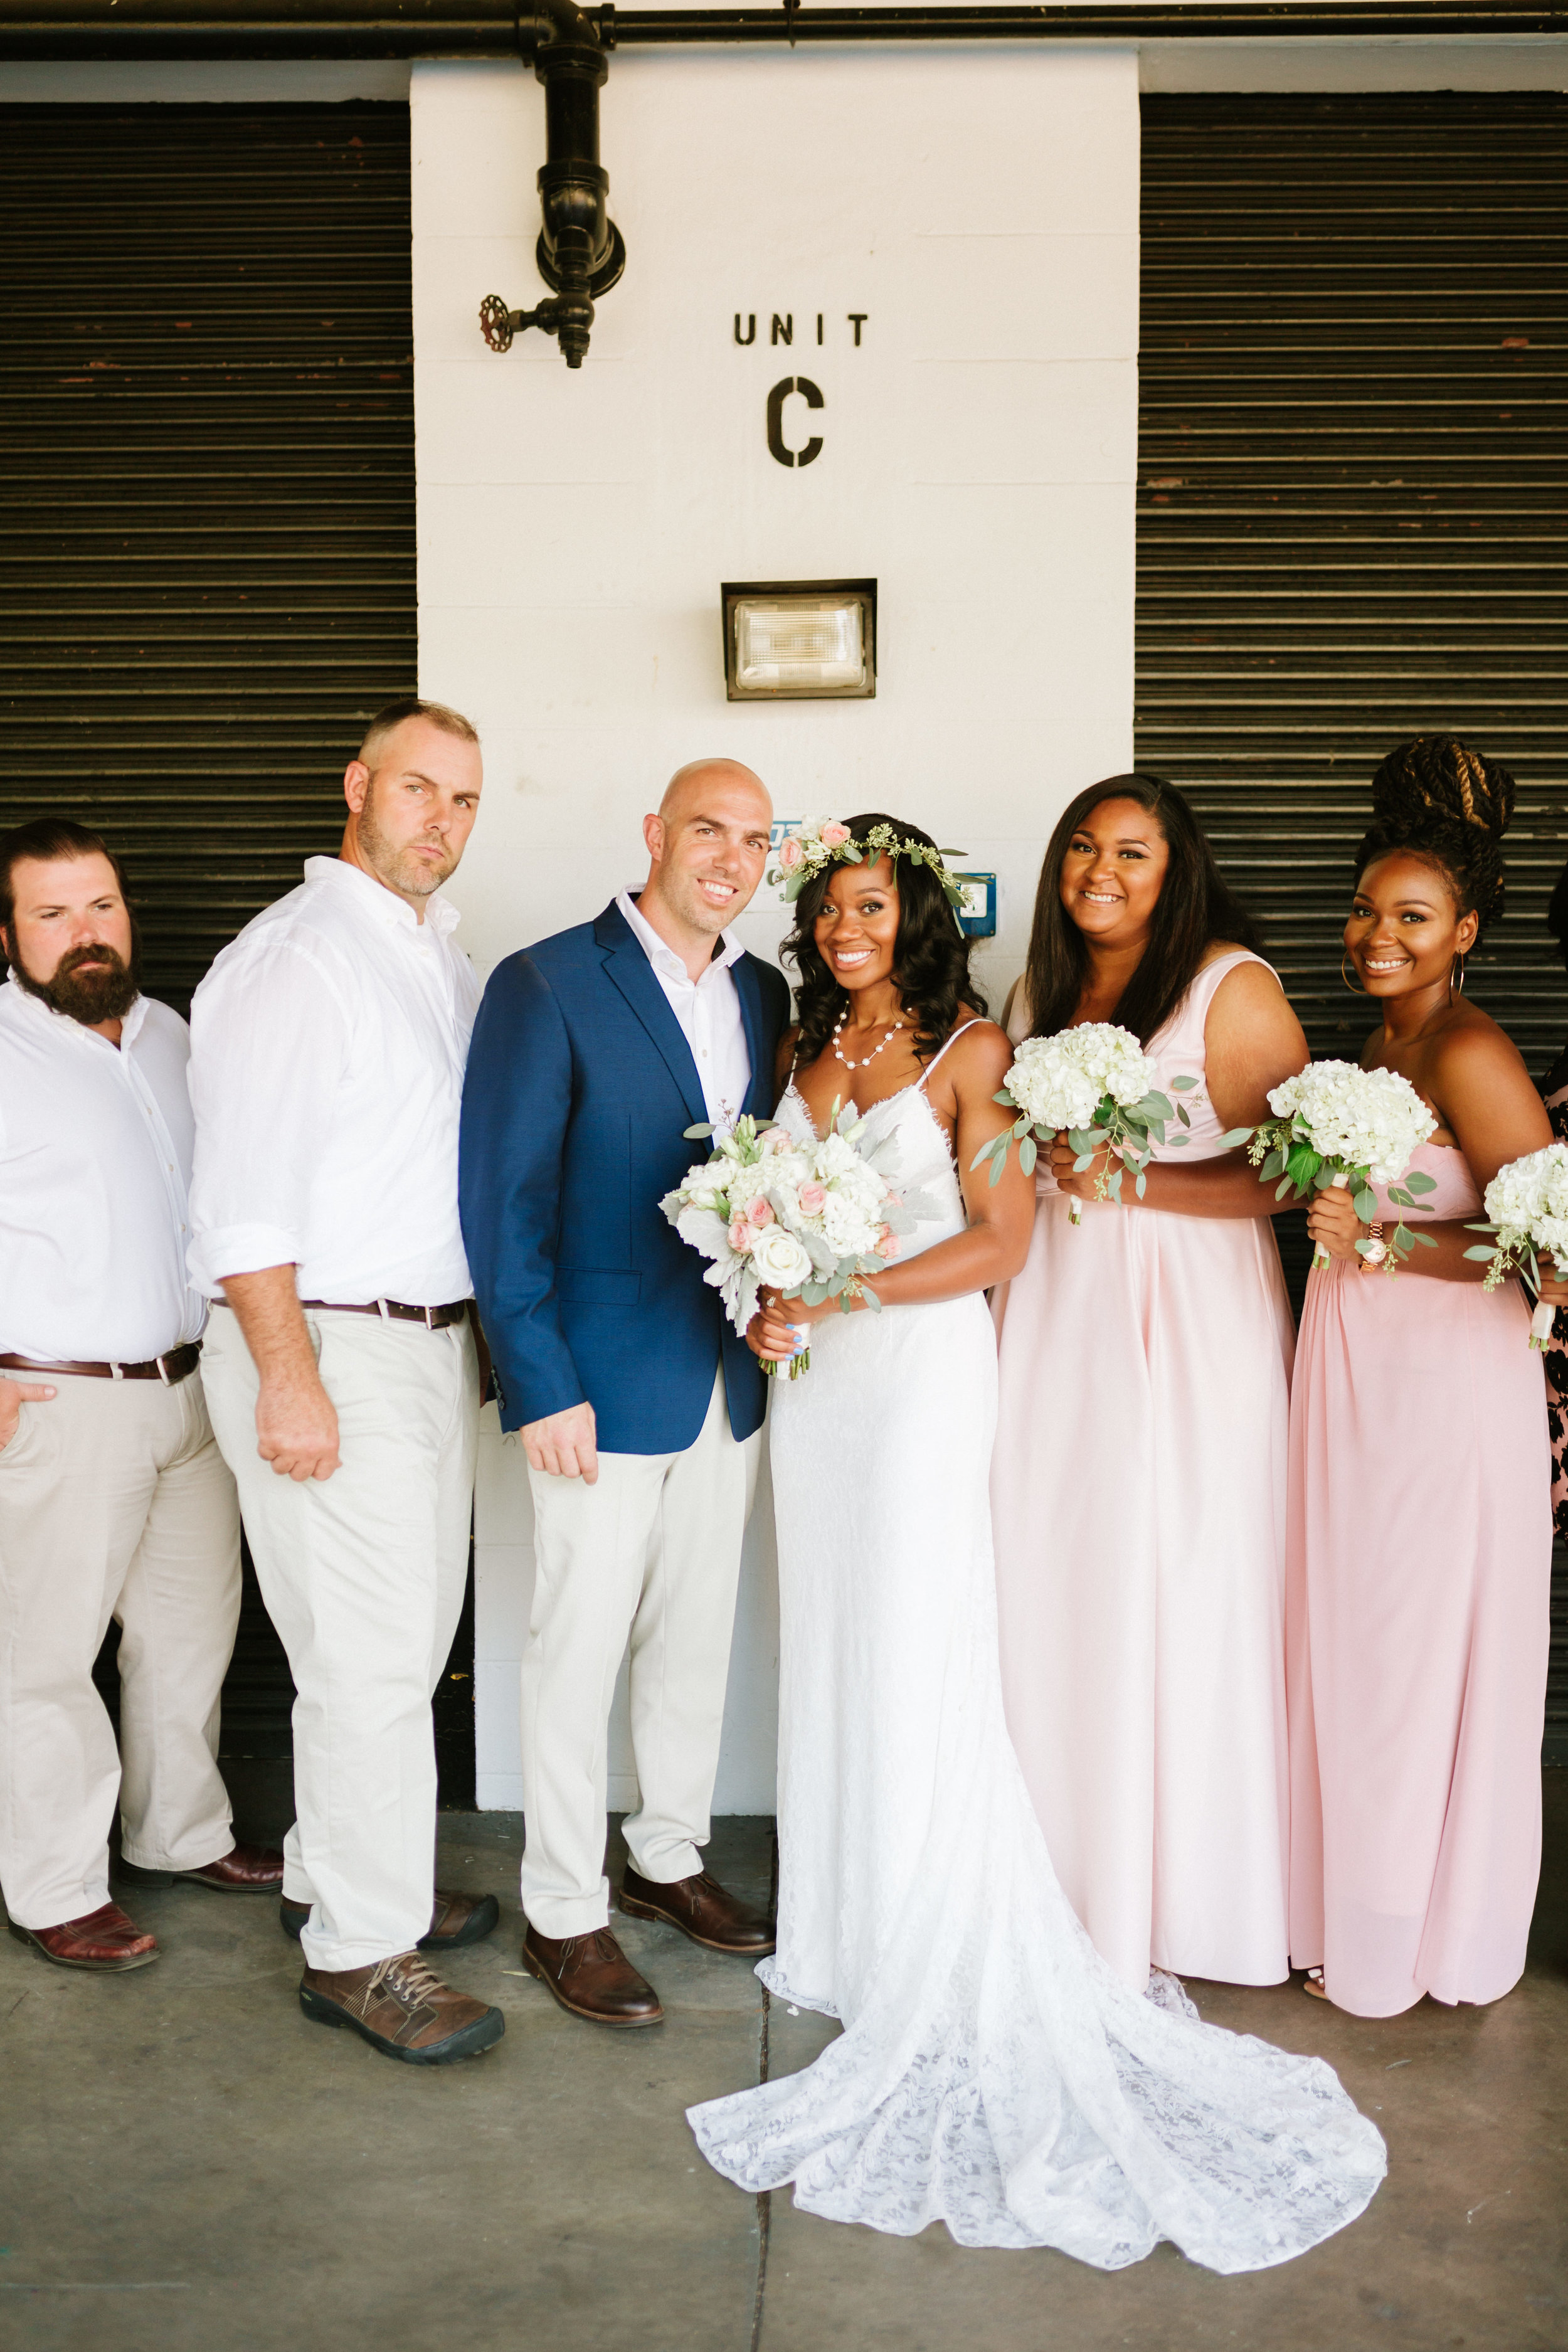 2017.09.16 Ashley and Chuck O'Day Quantam Leap Winery Wedding (233 of 462).jpg